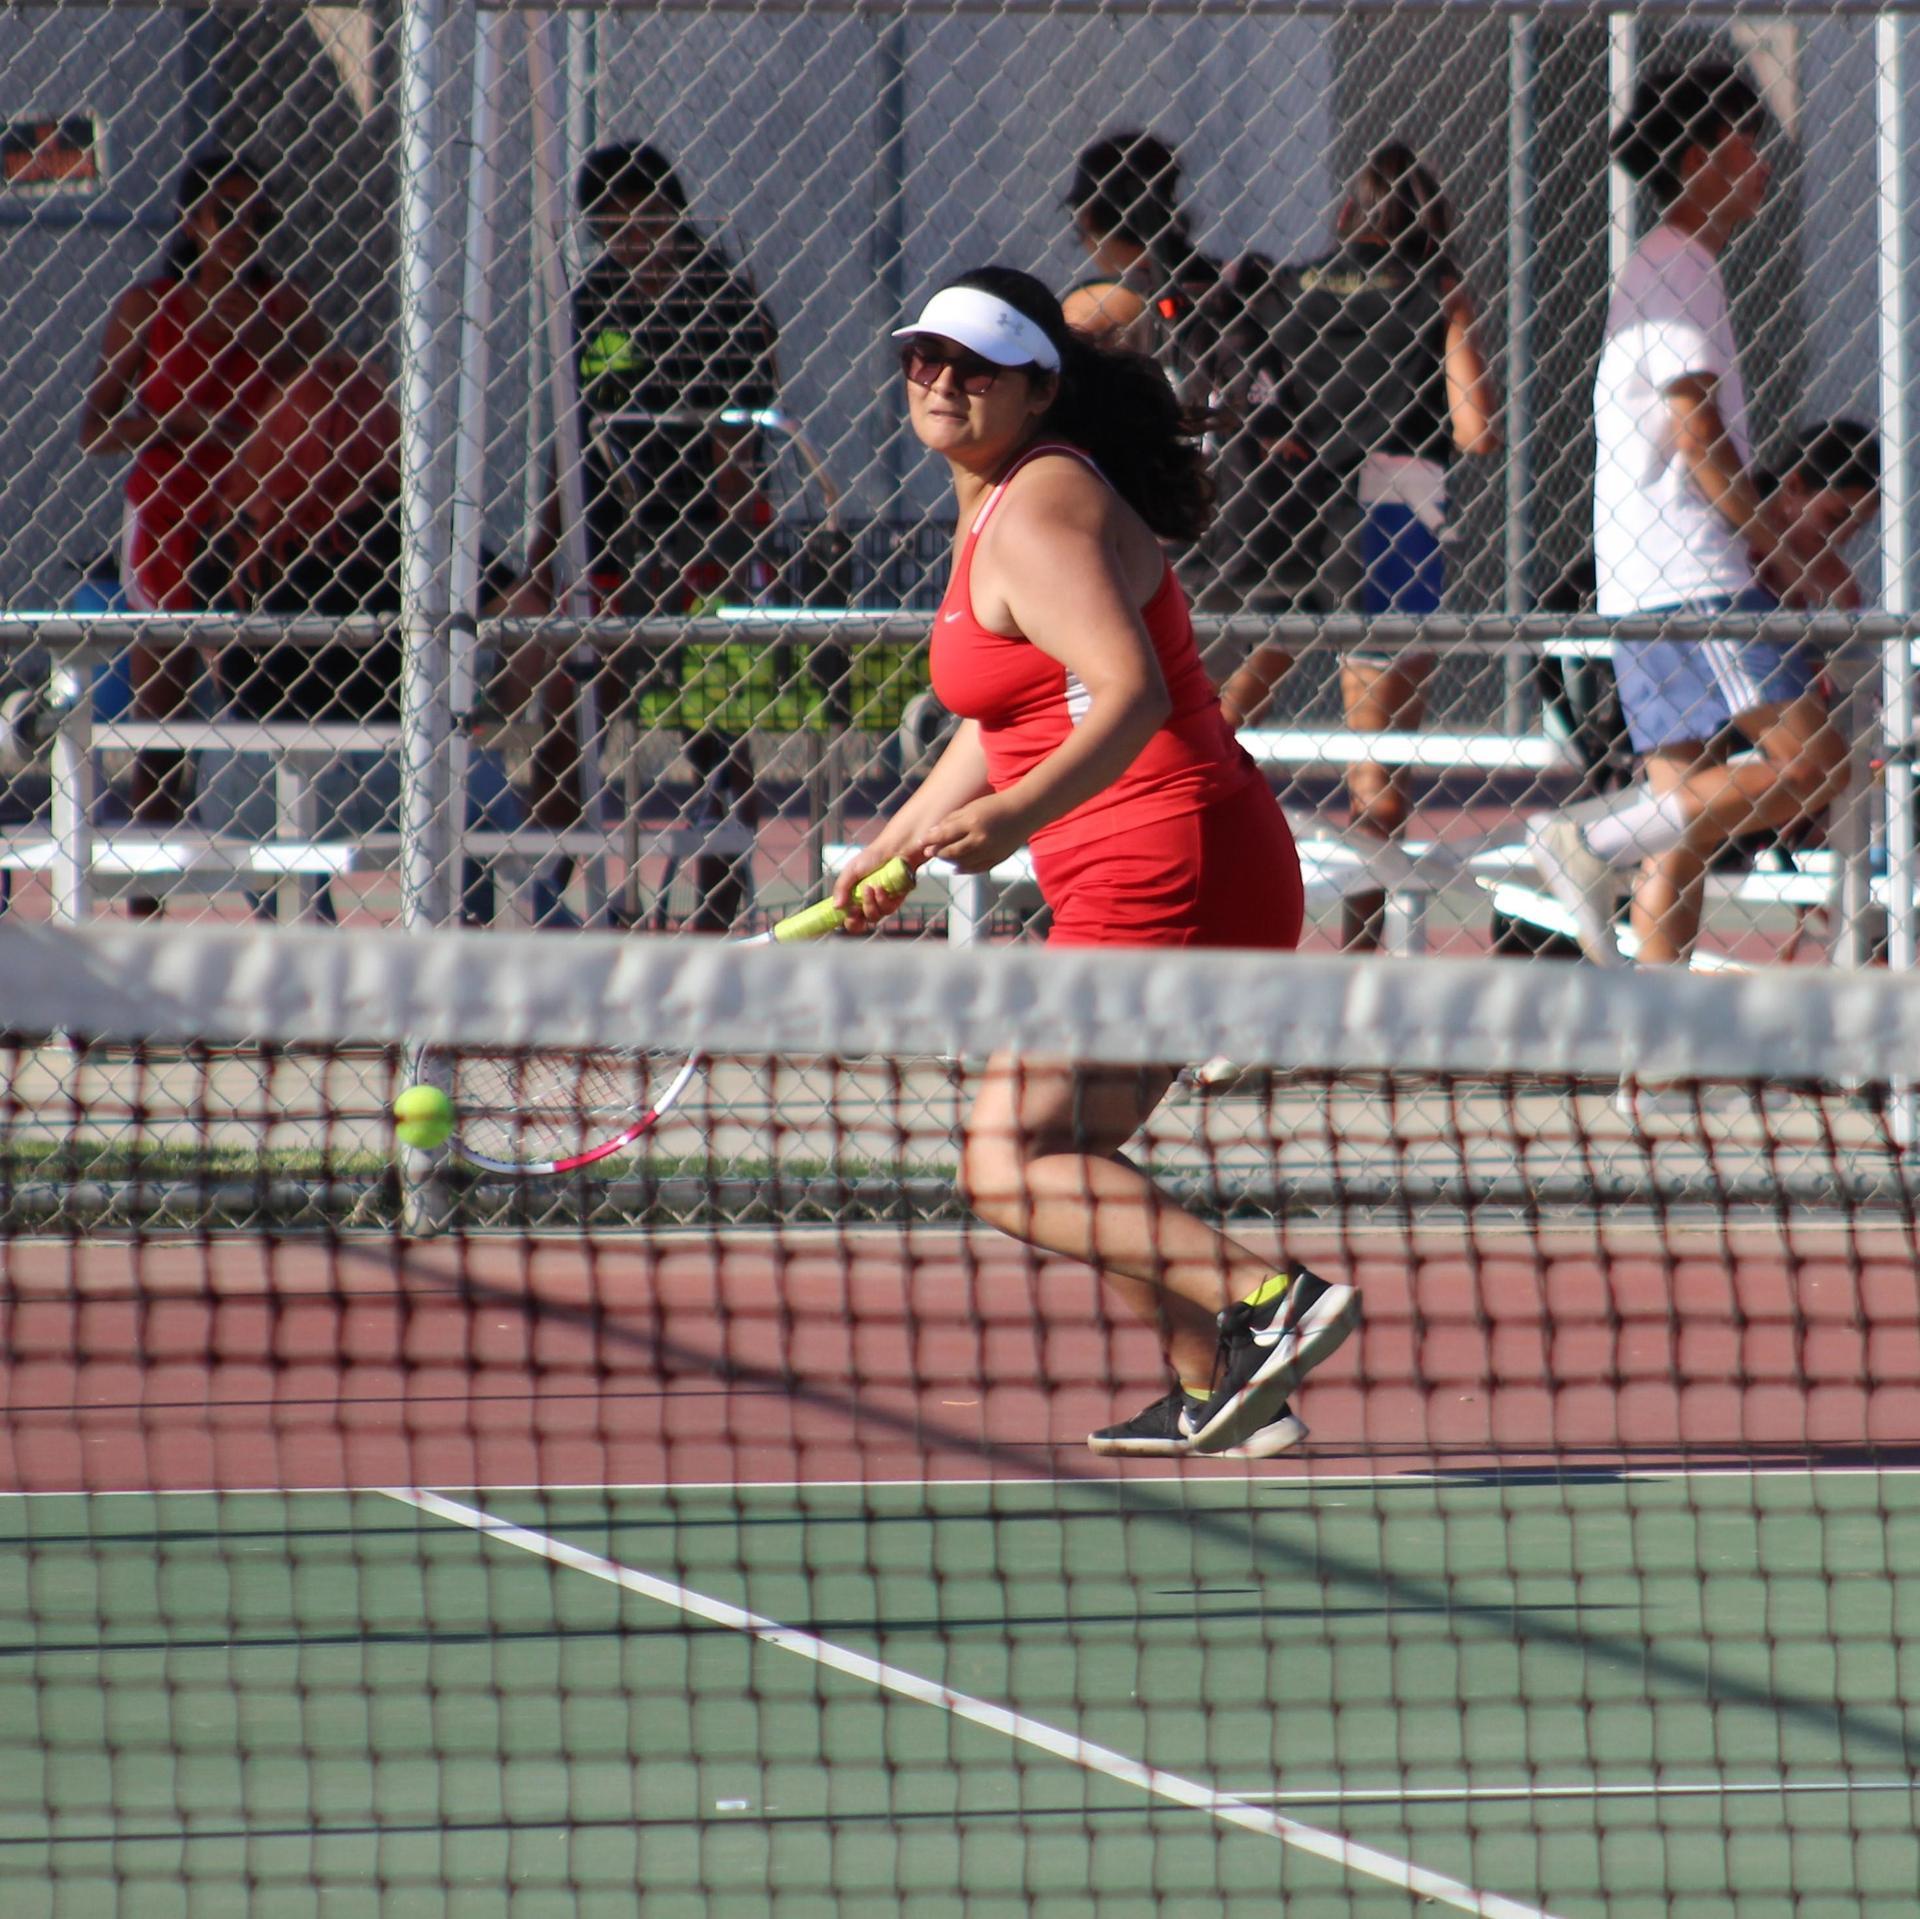 Girls playing tennis against Golden Valley